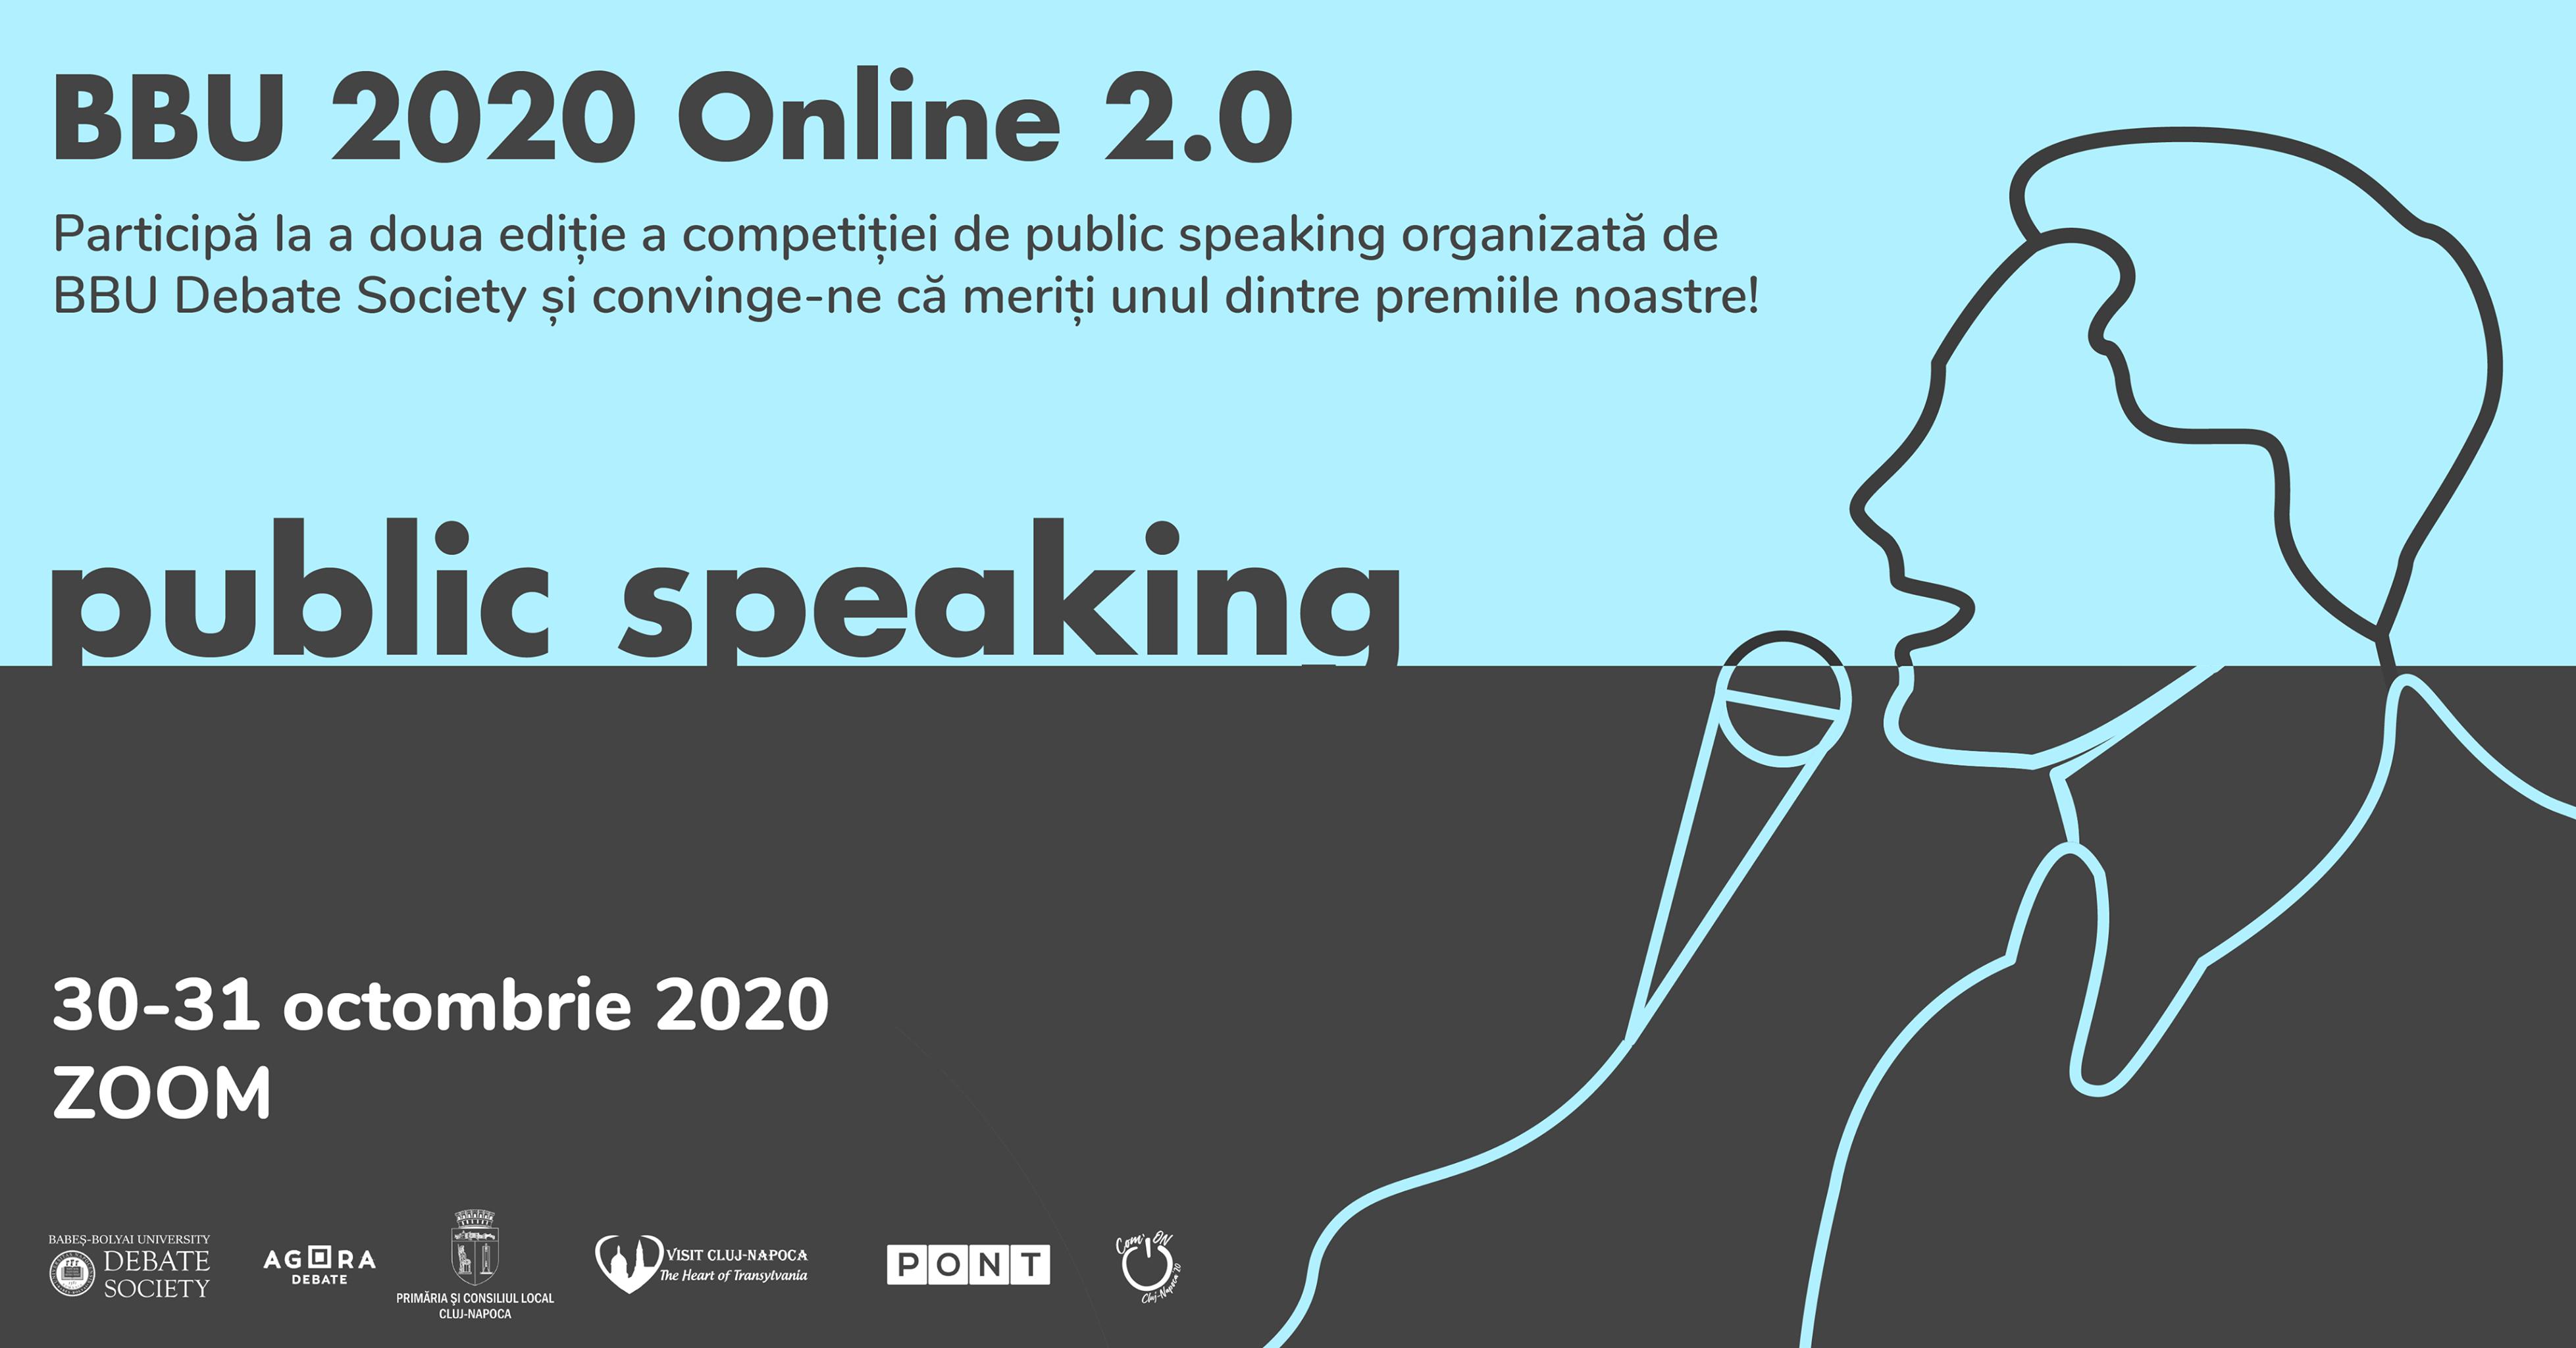 BBU 2020 Online 2.0: Competitie de Public Speaking pentru studenti